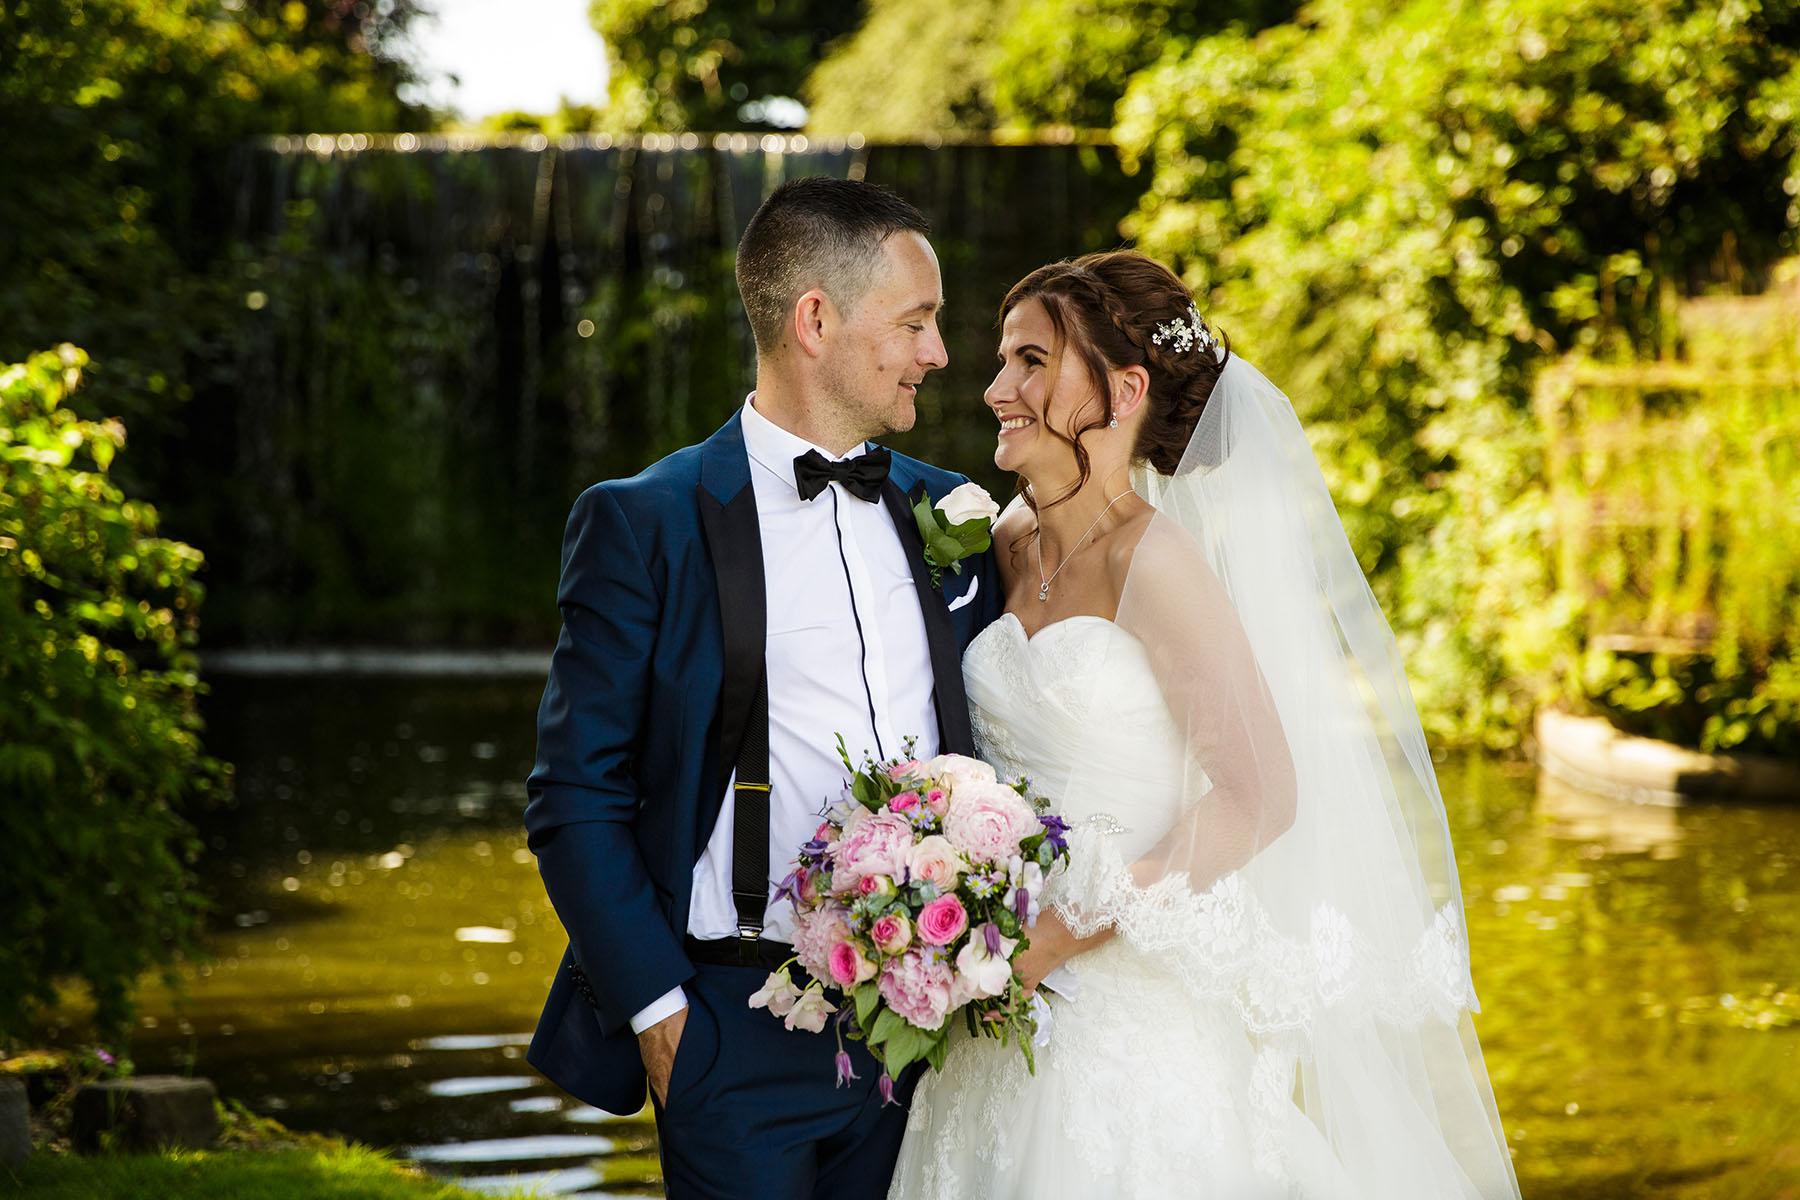 Portal Hotel bridal portrait